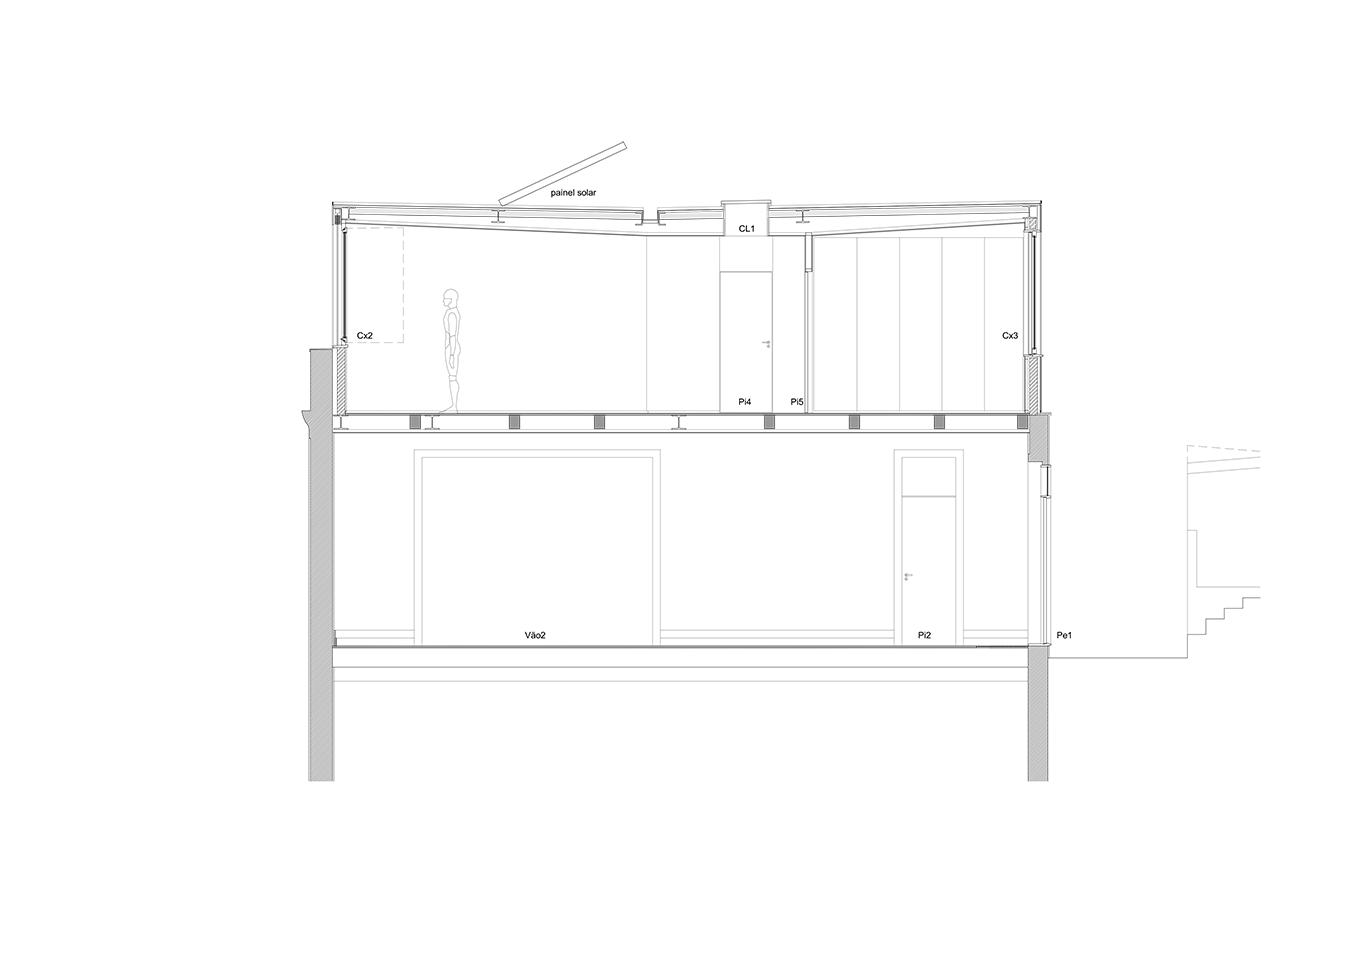 Corte 2 — Esc. 1/150